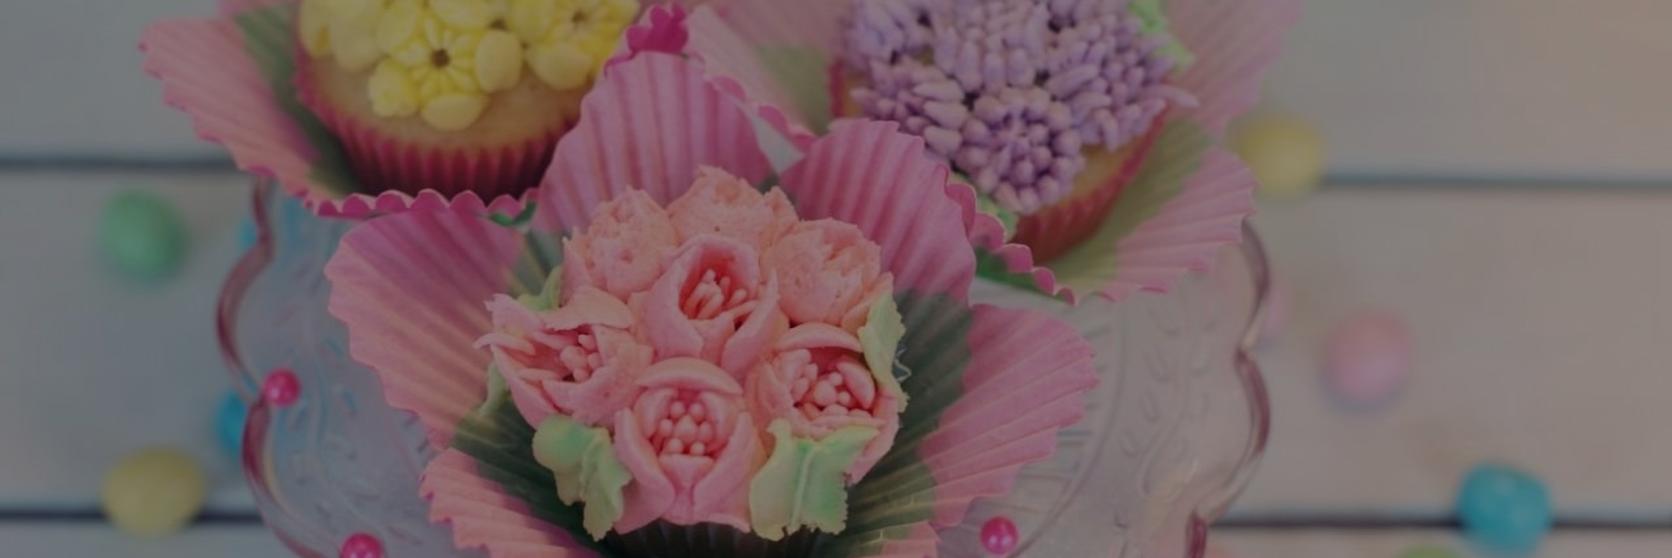 How-to-make-fondant-flowers-1